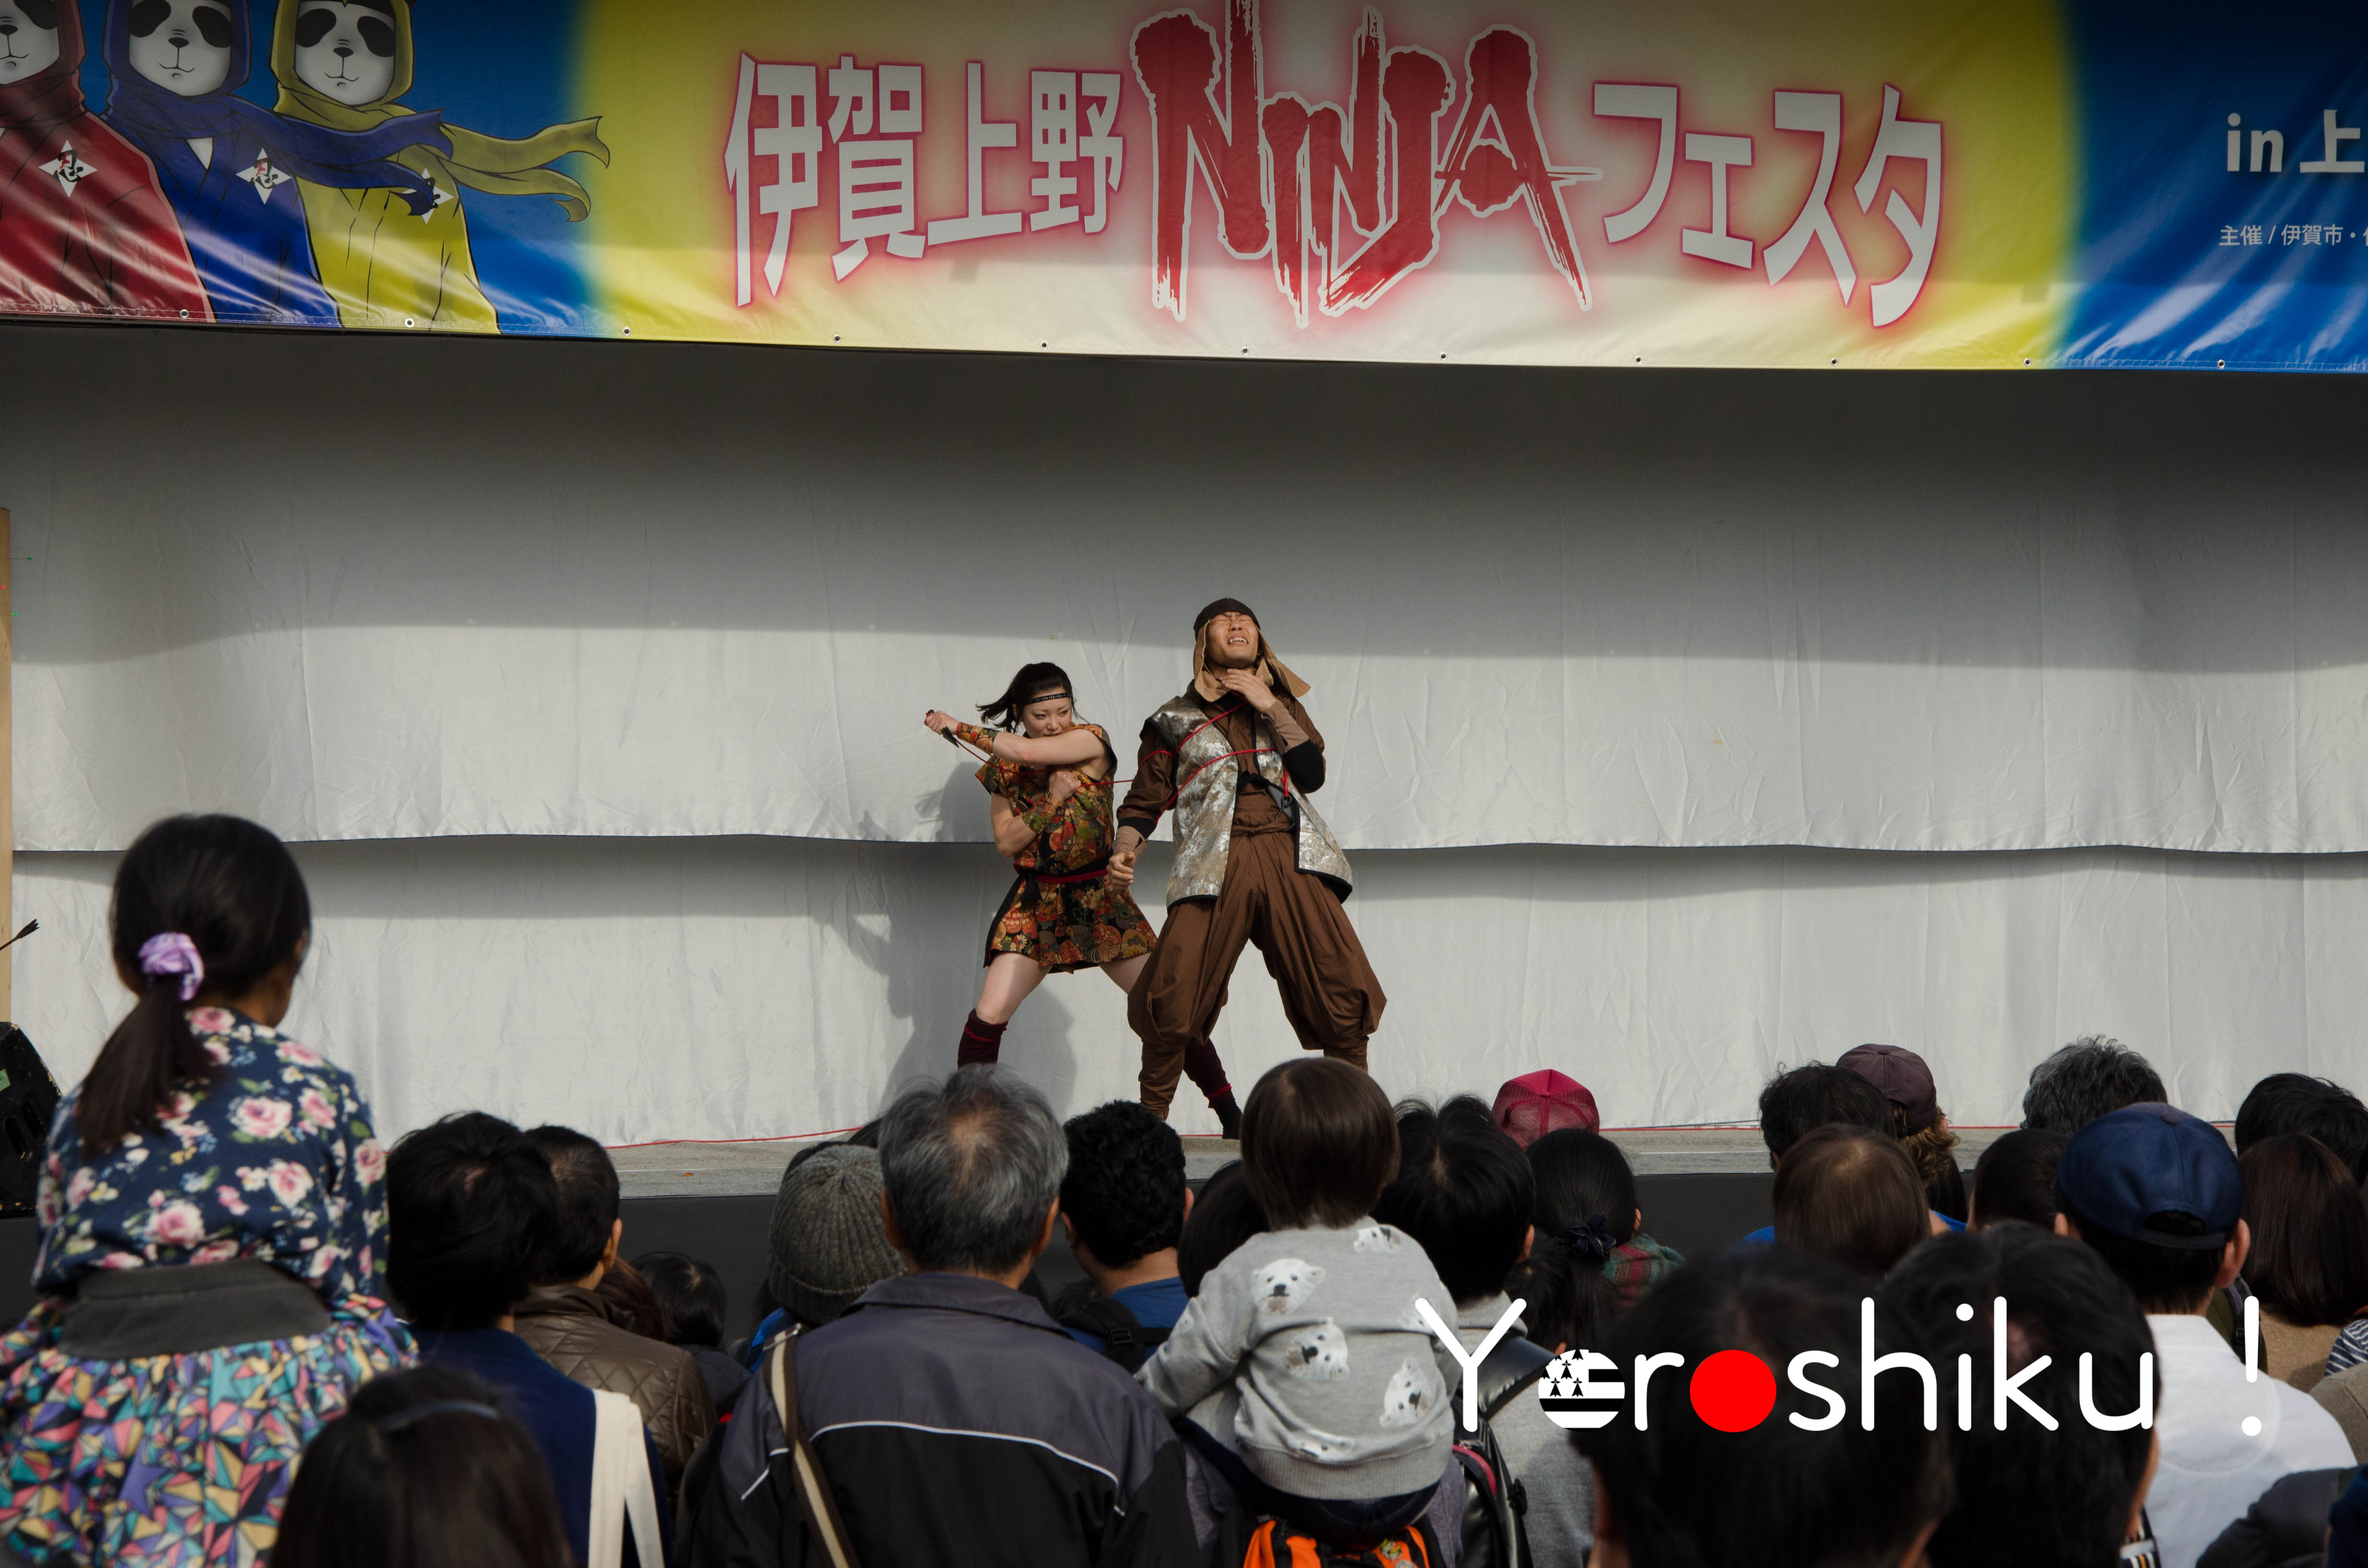 iga-ueno-ninja-festa-2-yoroshiku